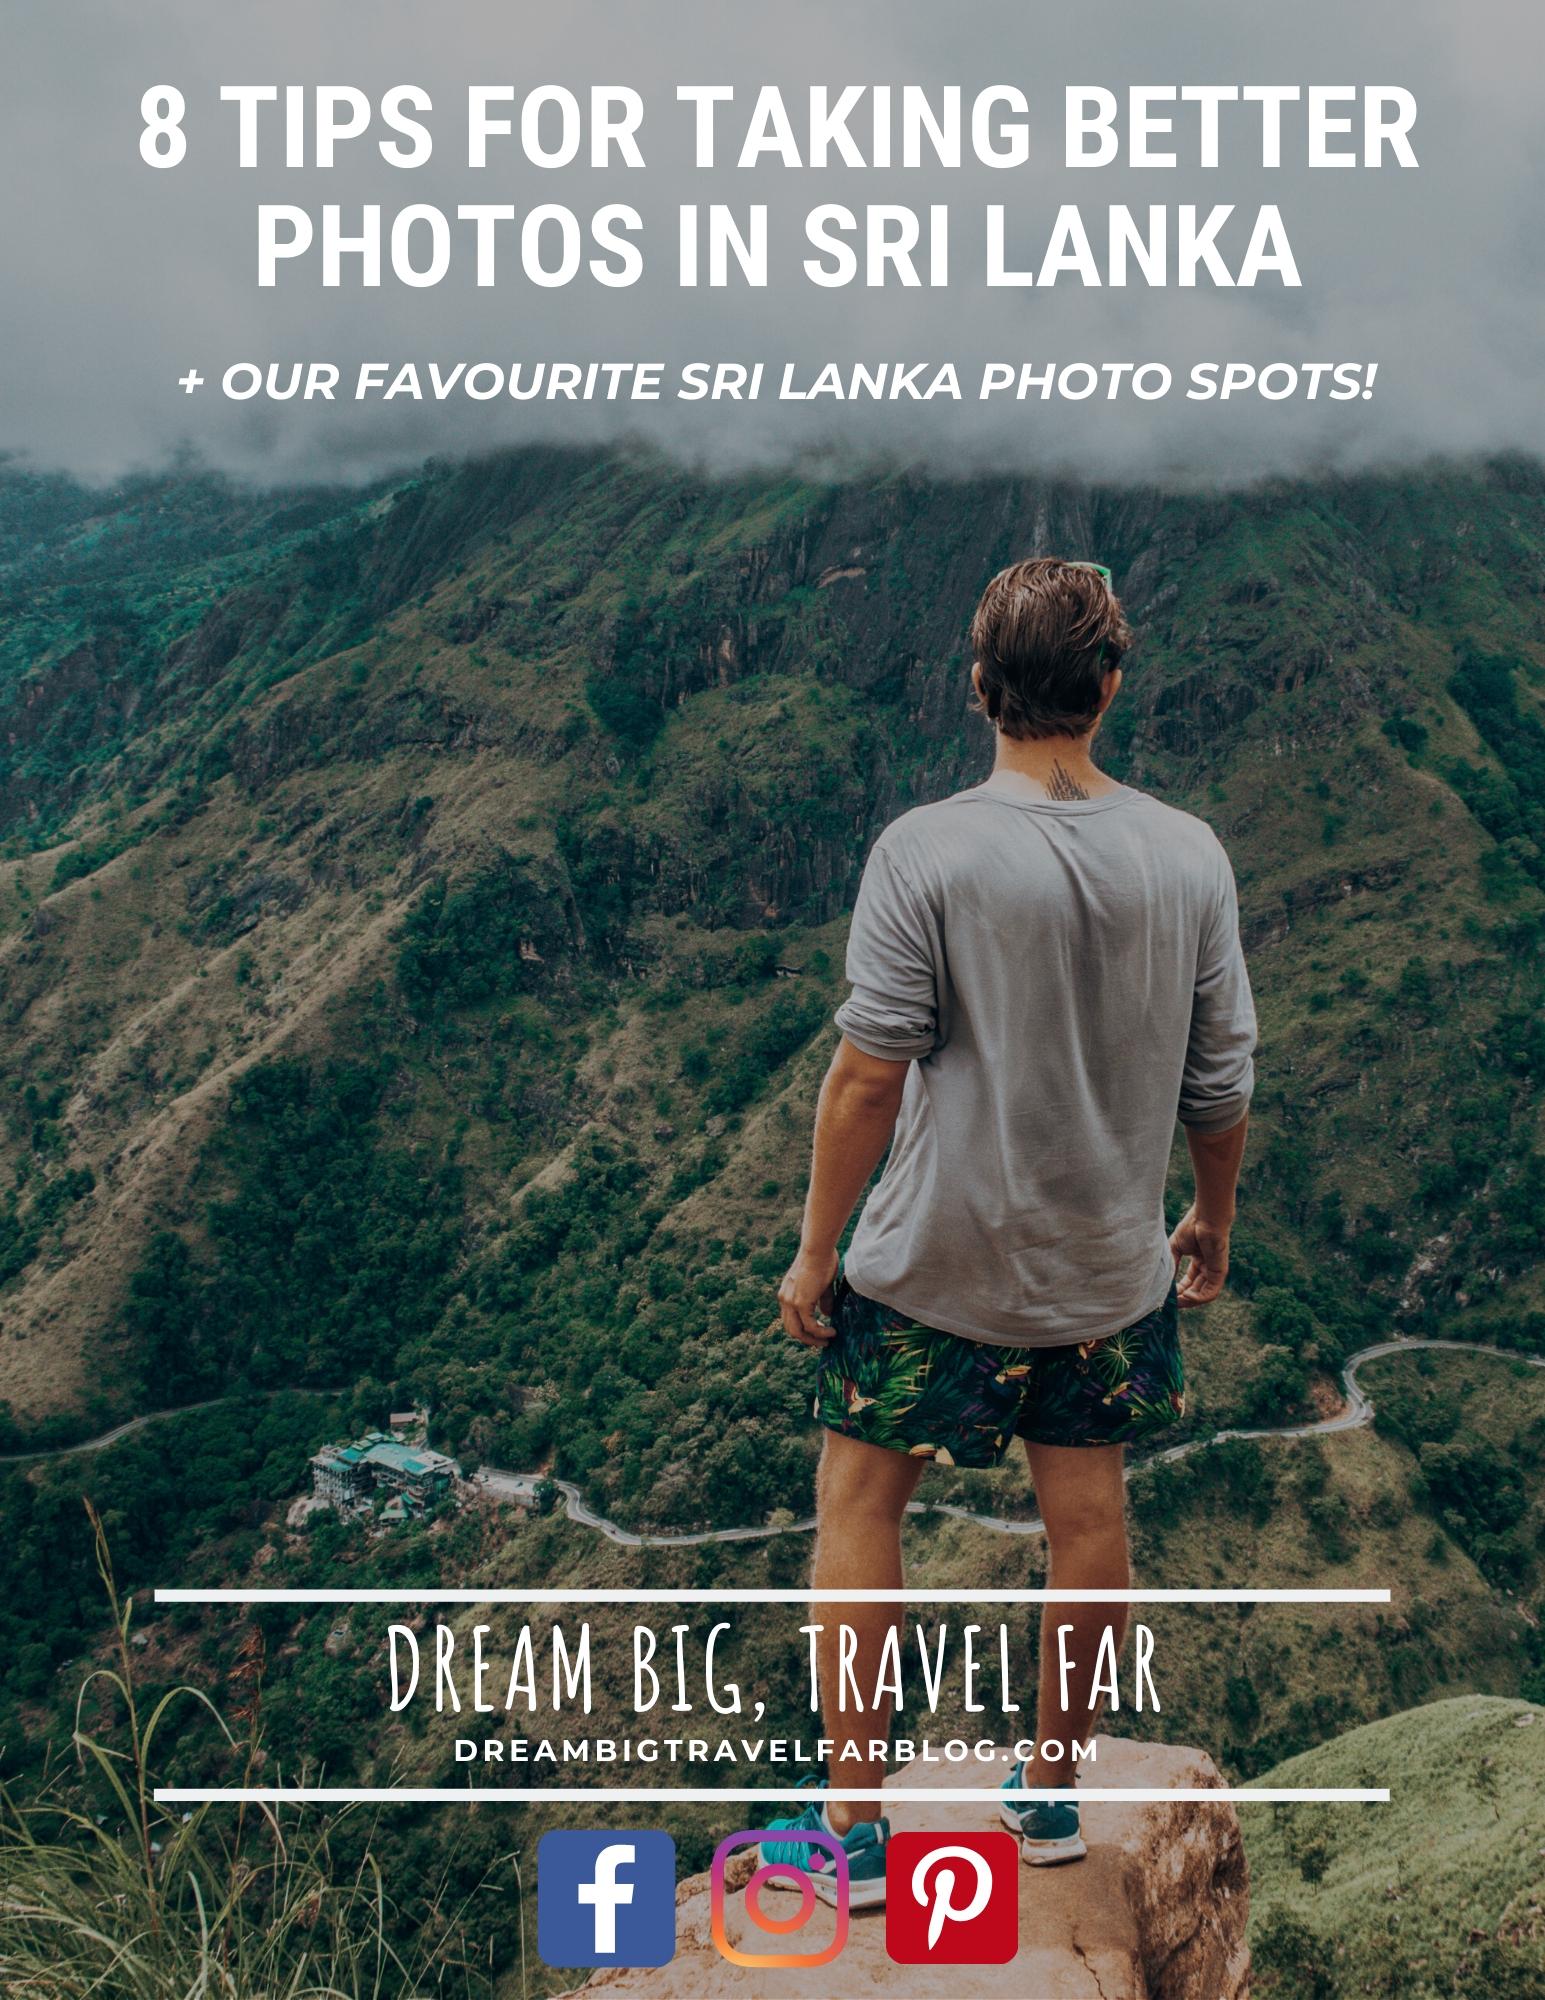 Sri Lanka photo tips cover image